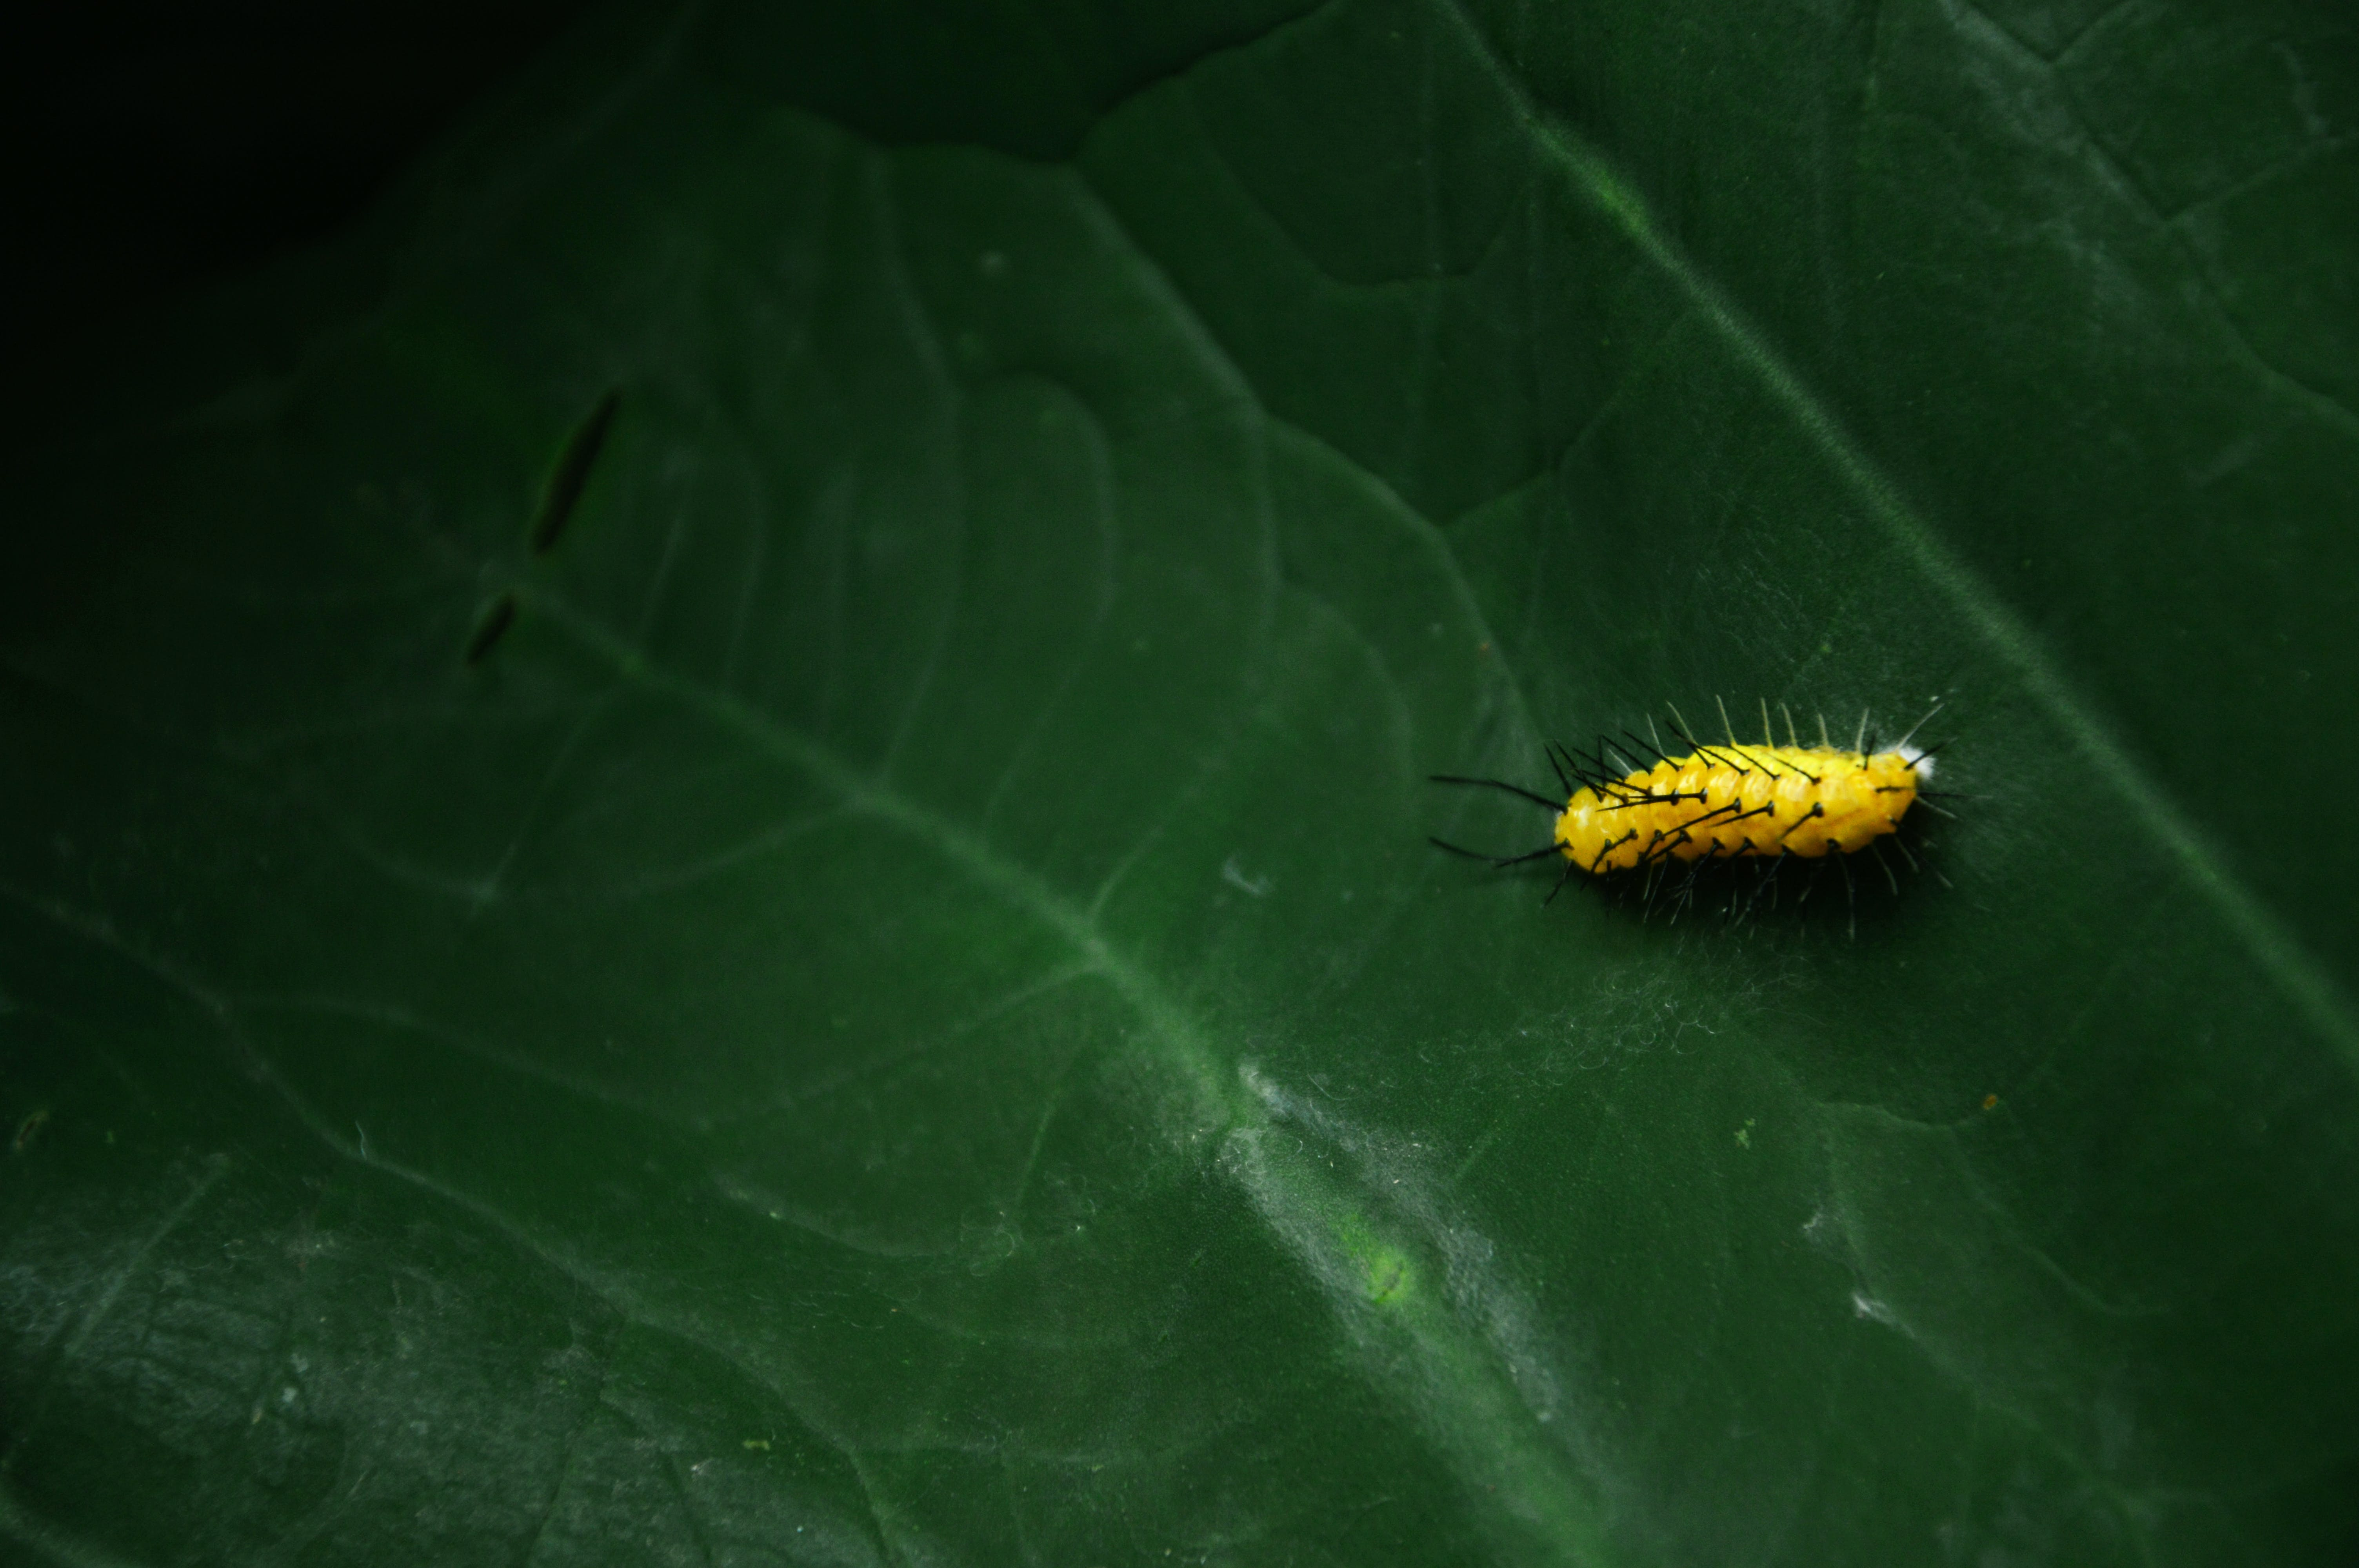 ecológico, inseto, lagarta